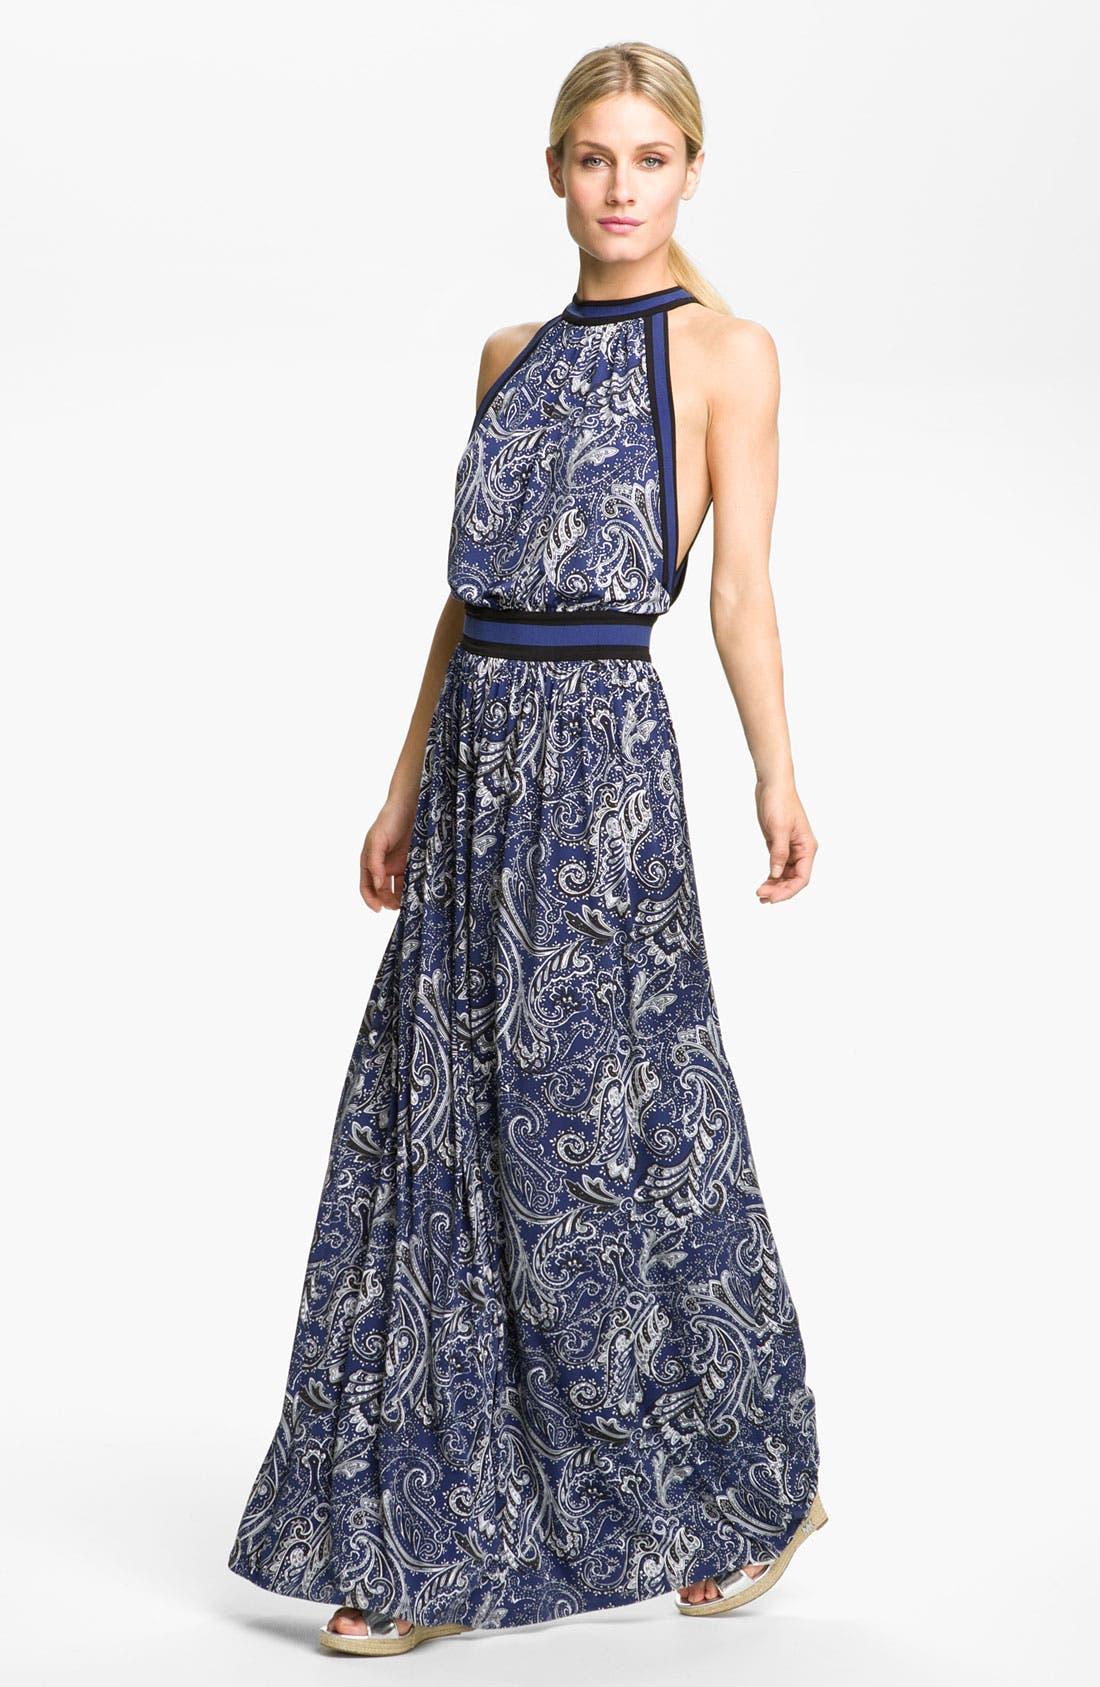 Alternate Image 1 Selected - MICHAEL Michael Kors Strap Back Maxi Dress